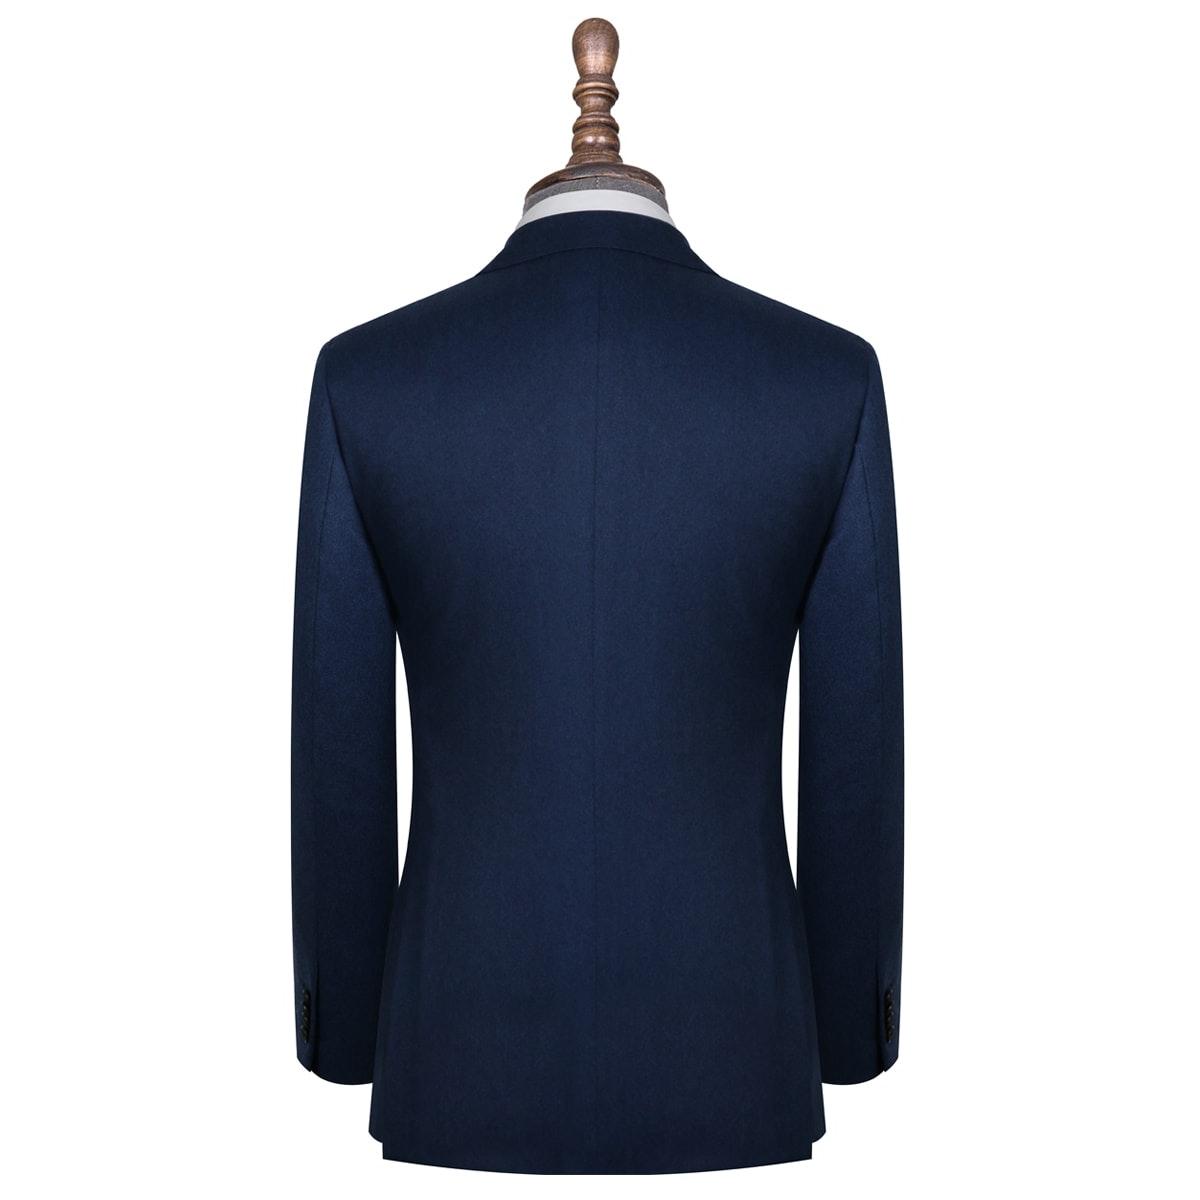 InStitchu Collection Bushelman Blue Wool Jacket